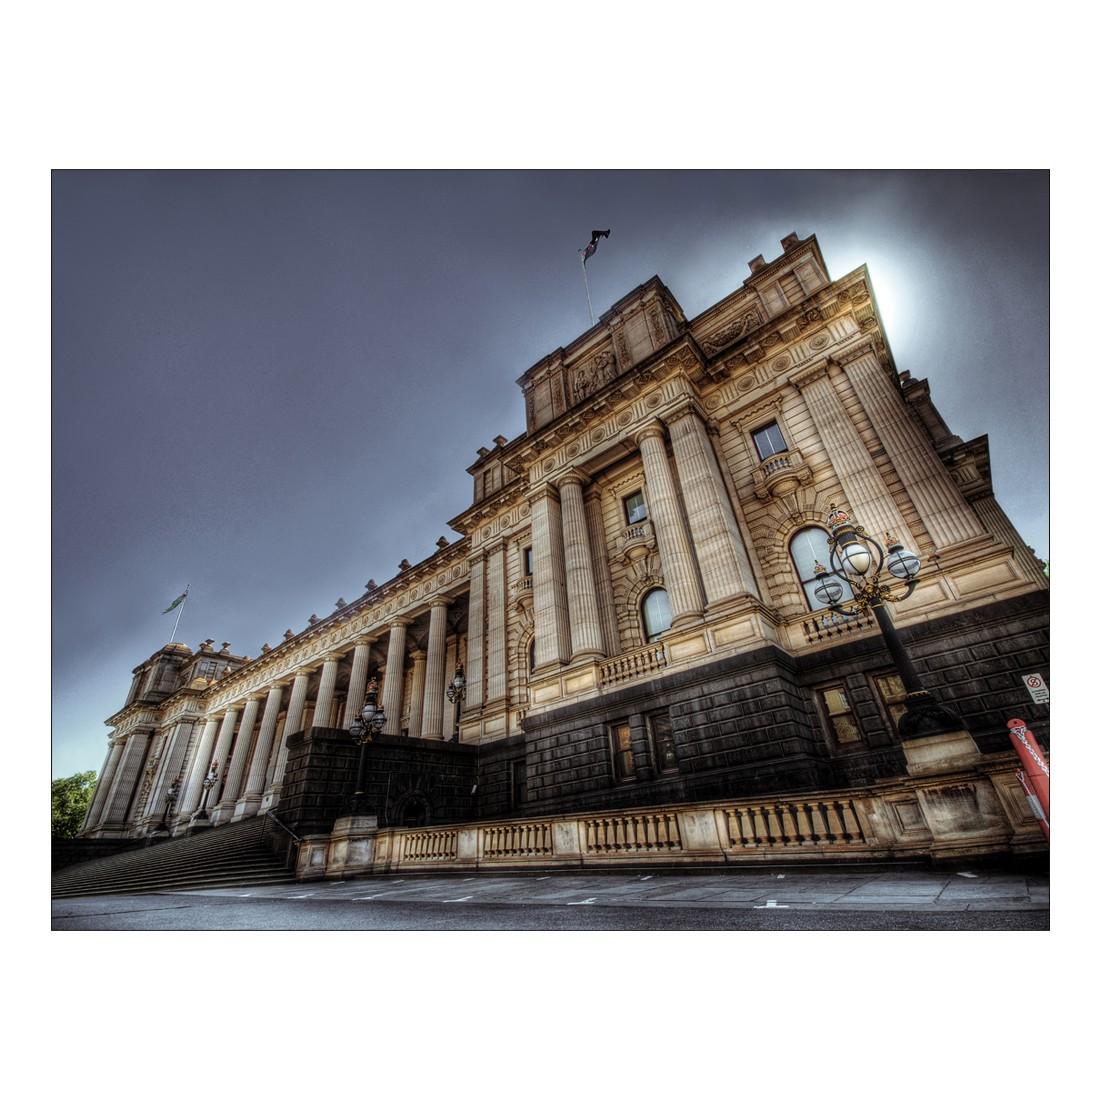 Leinwandbild Parlament US – 100 x 75cm, Gallery of Innovative Art kaufen